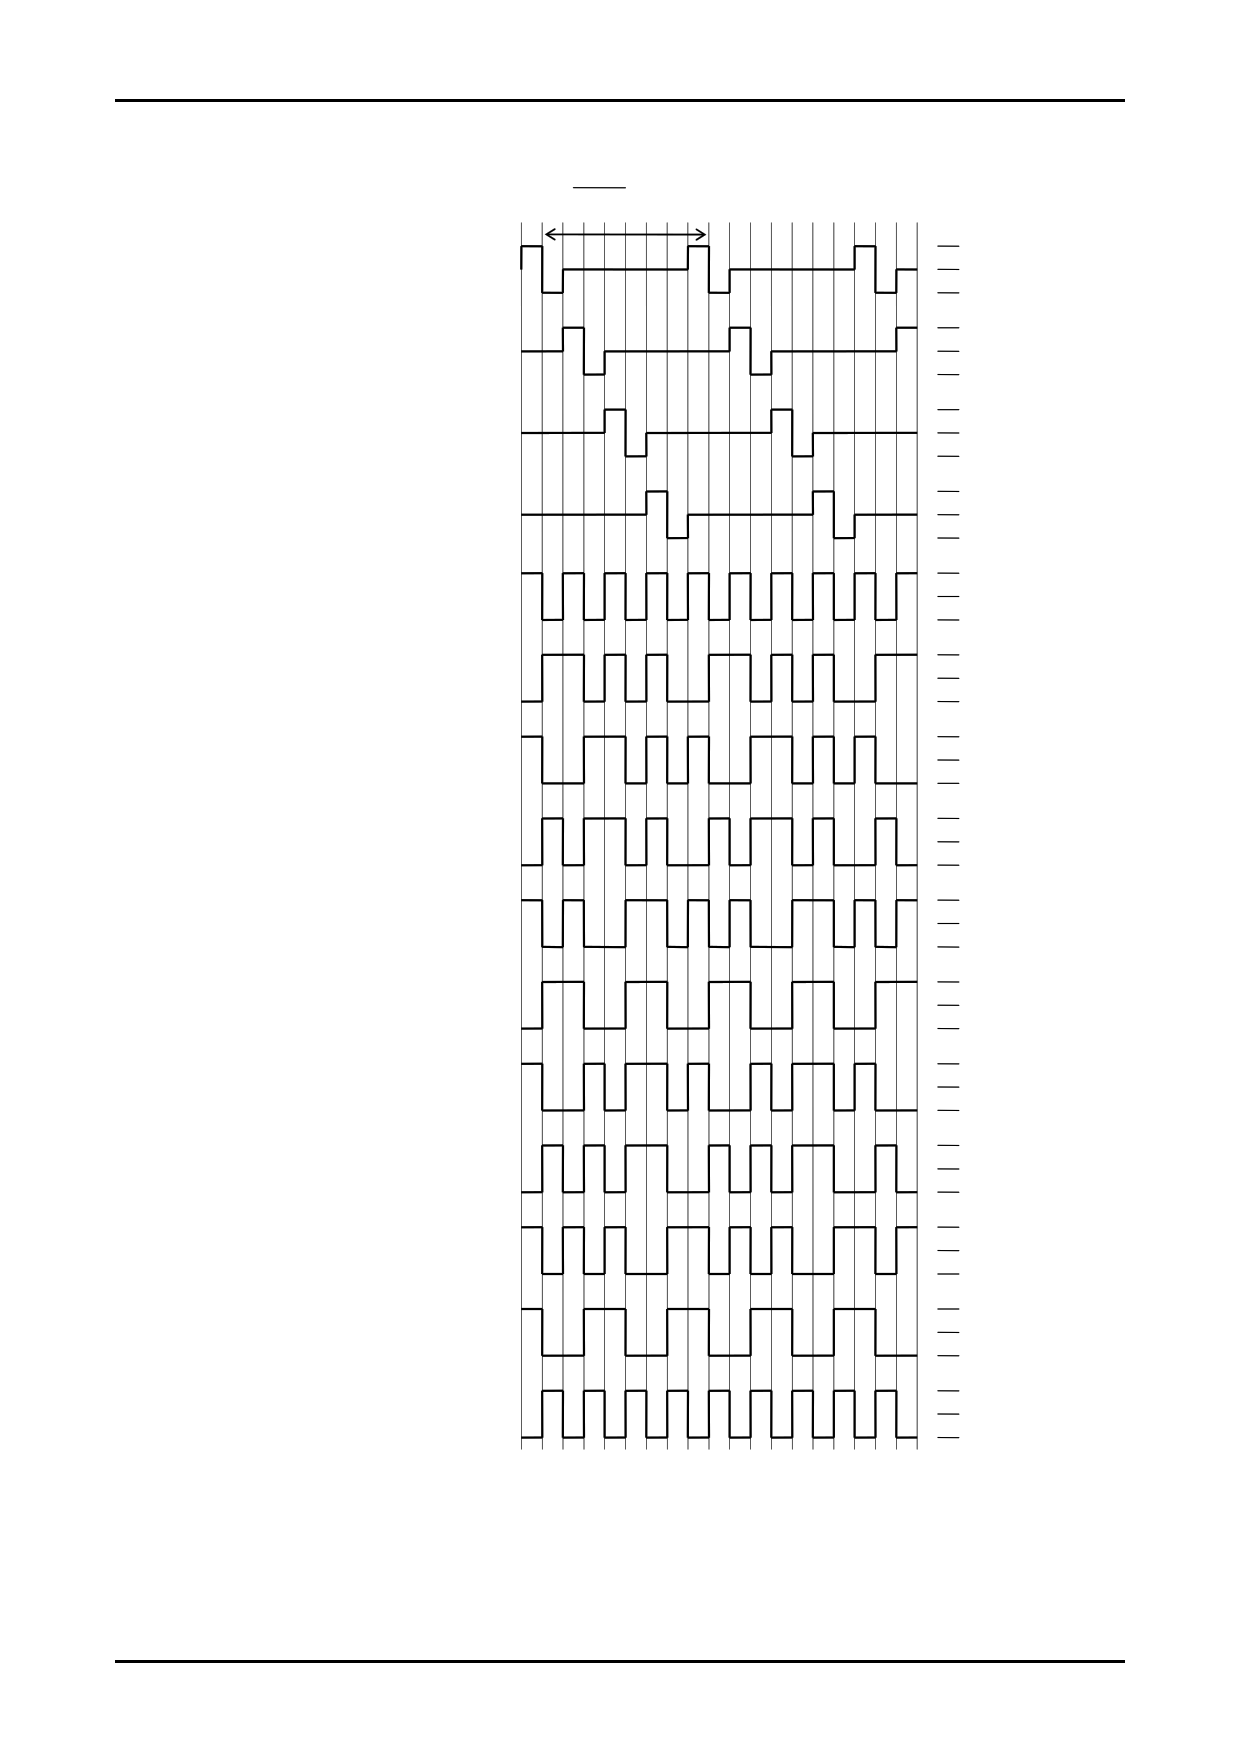 LC75844M arduino